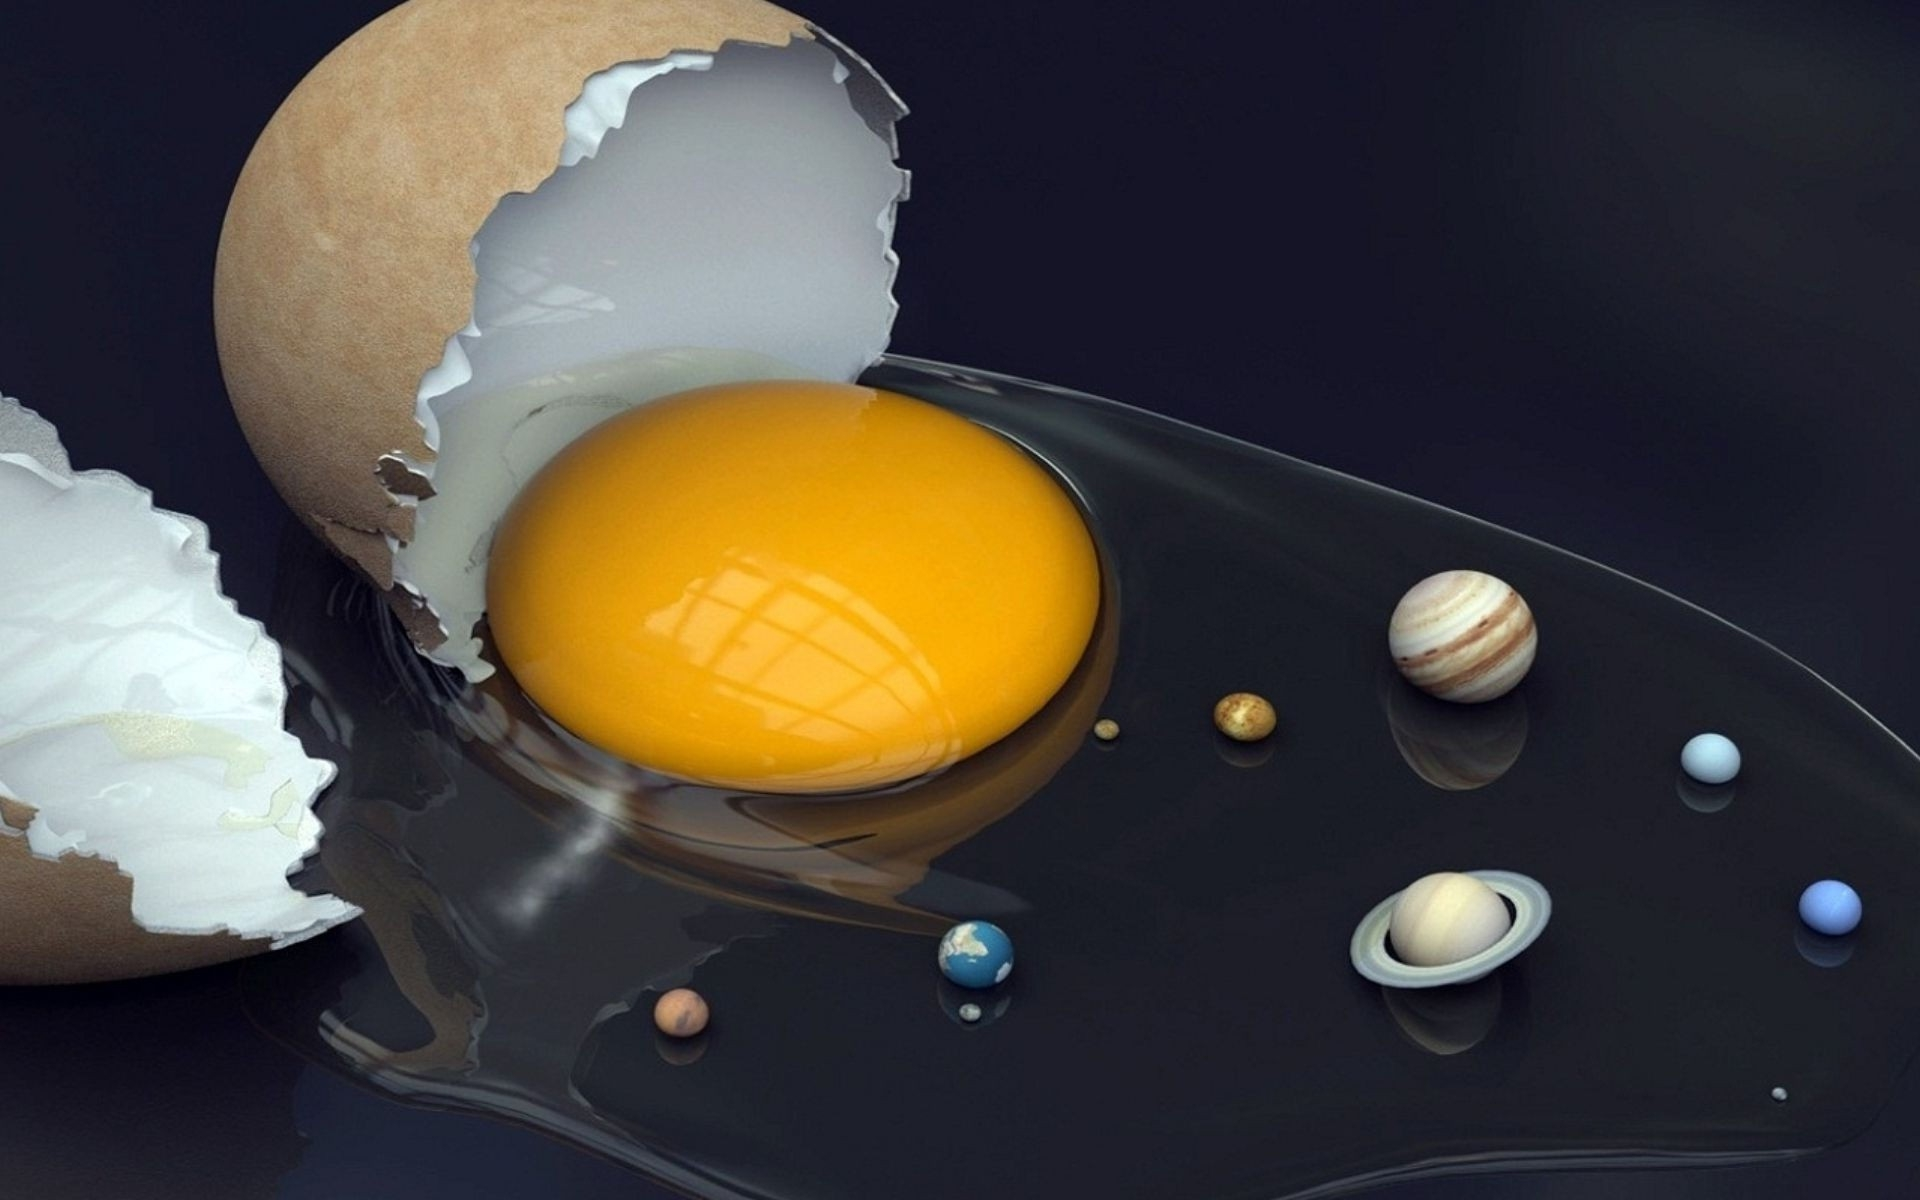 solar system hd wallpaper - photo #23